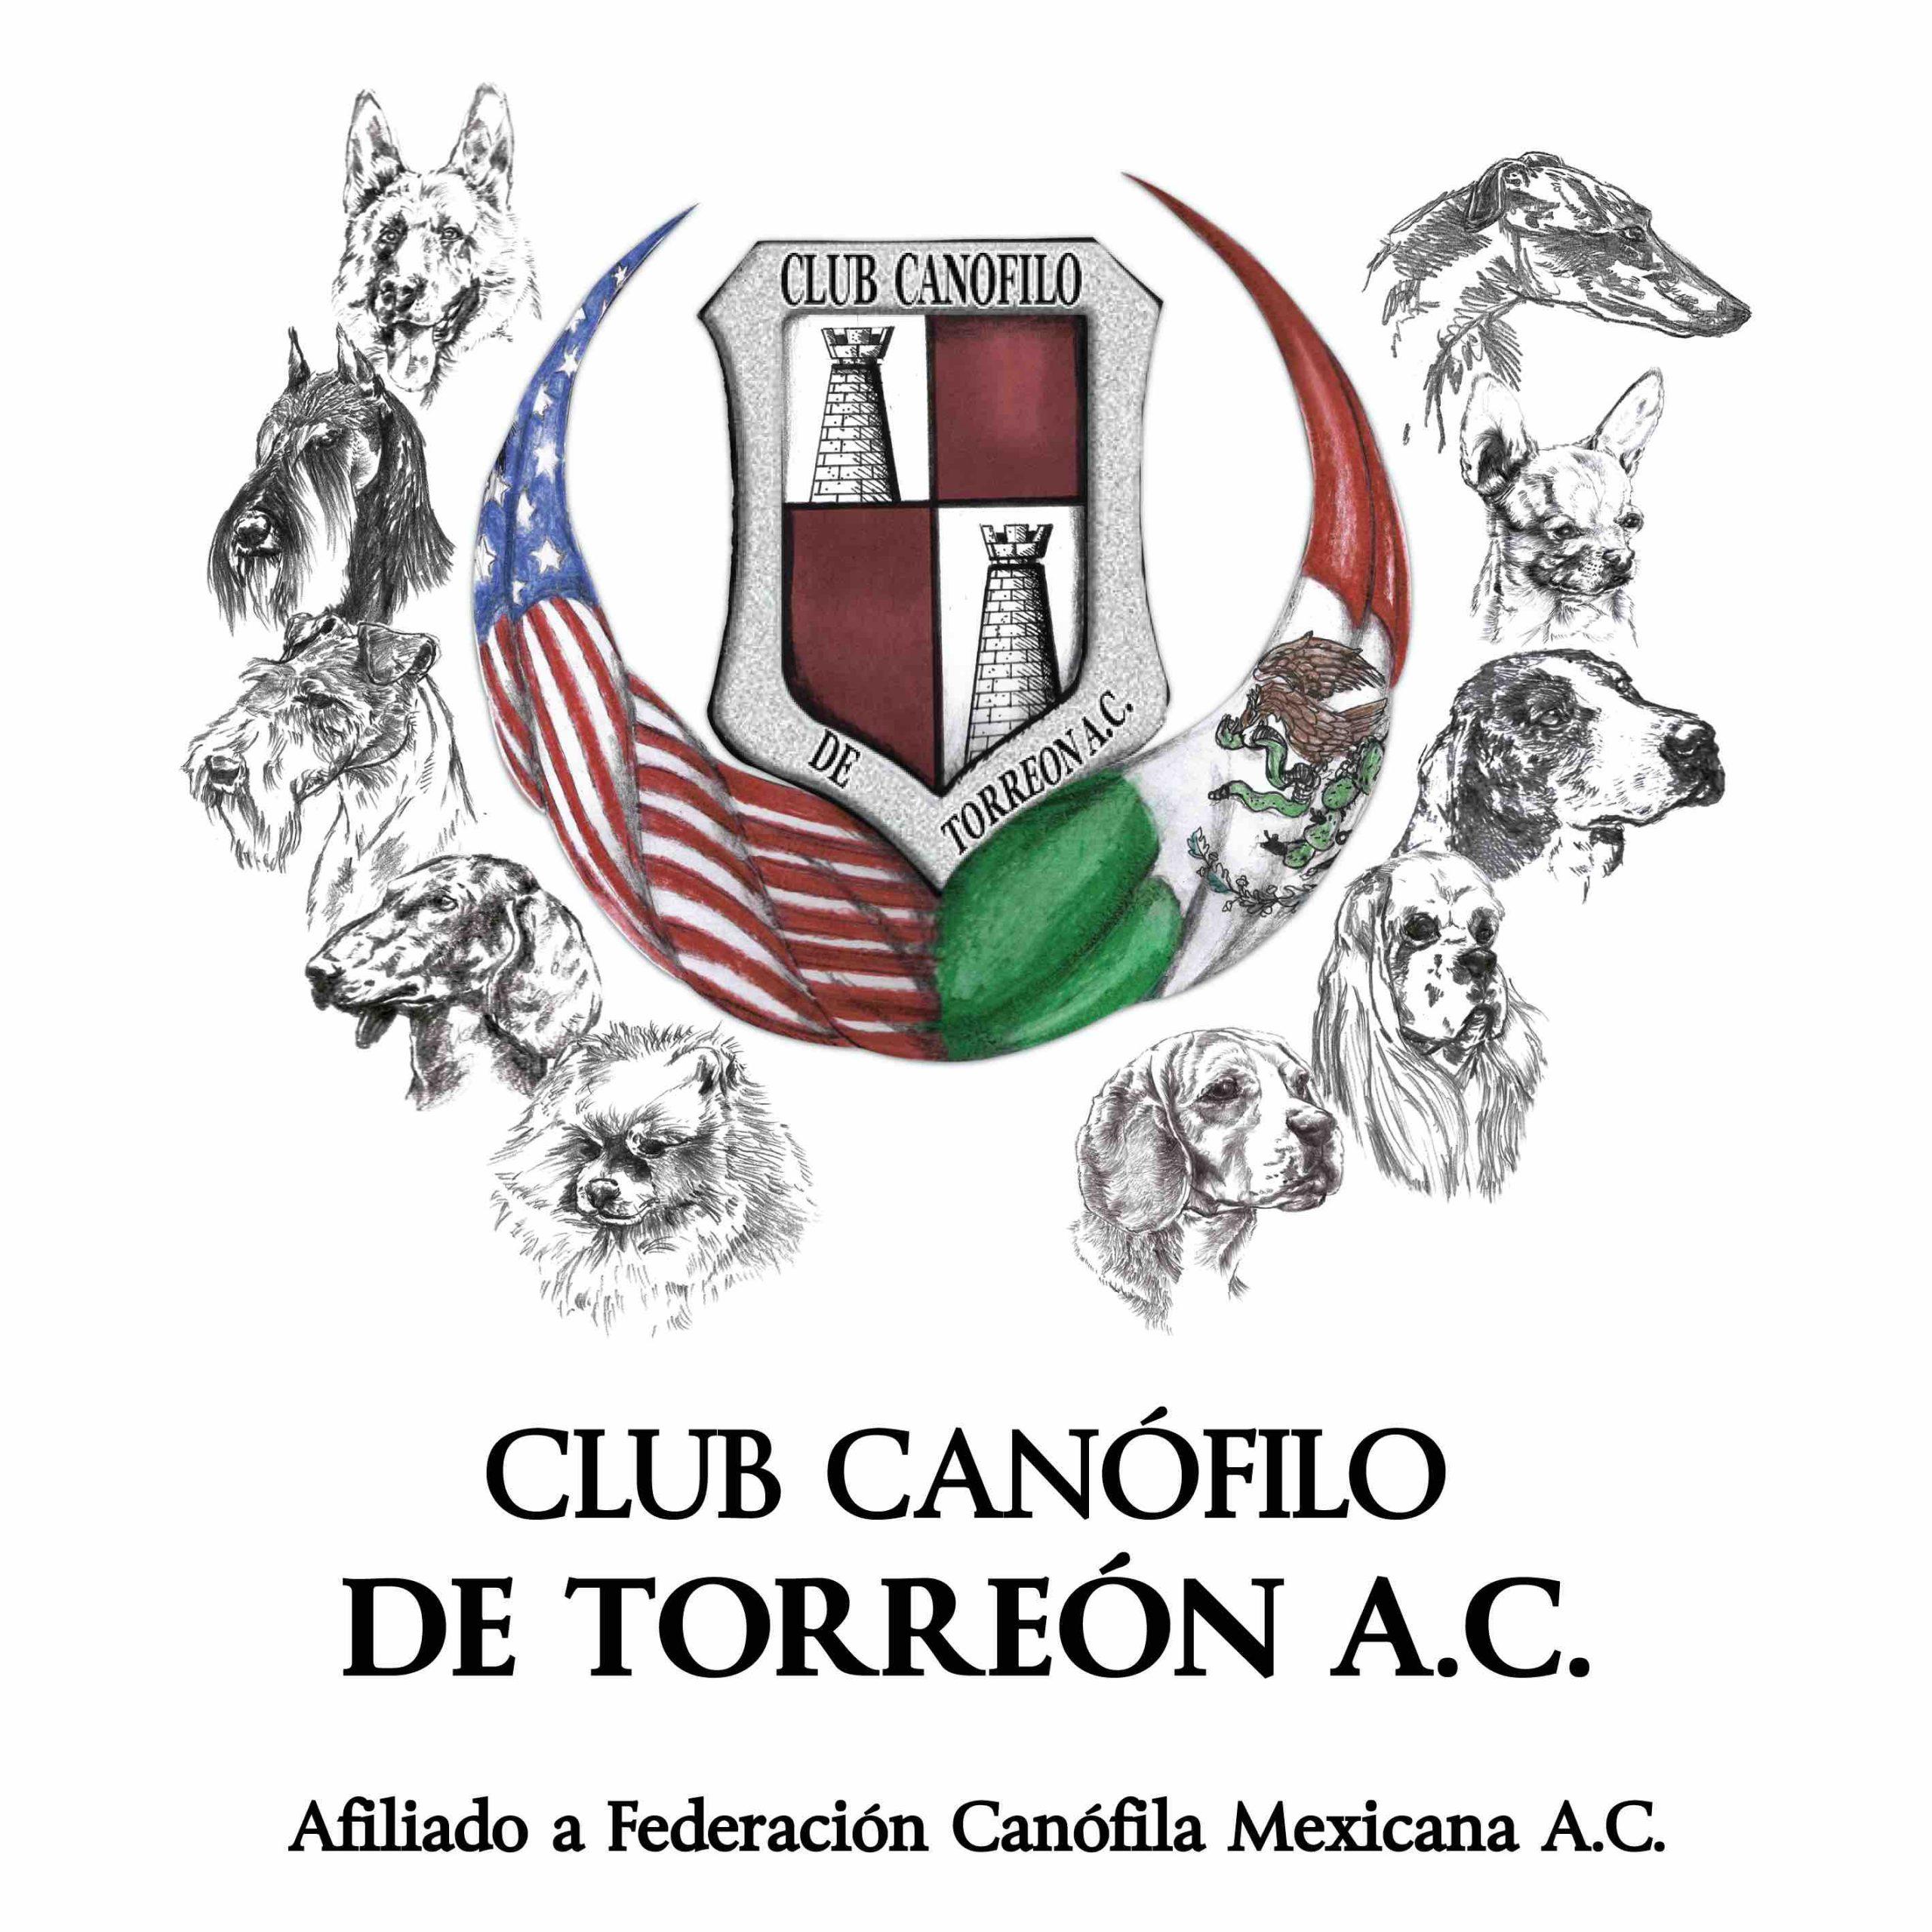 Club Canófilo de Torreón, AC.